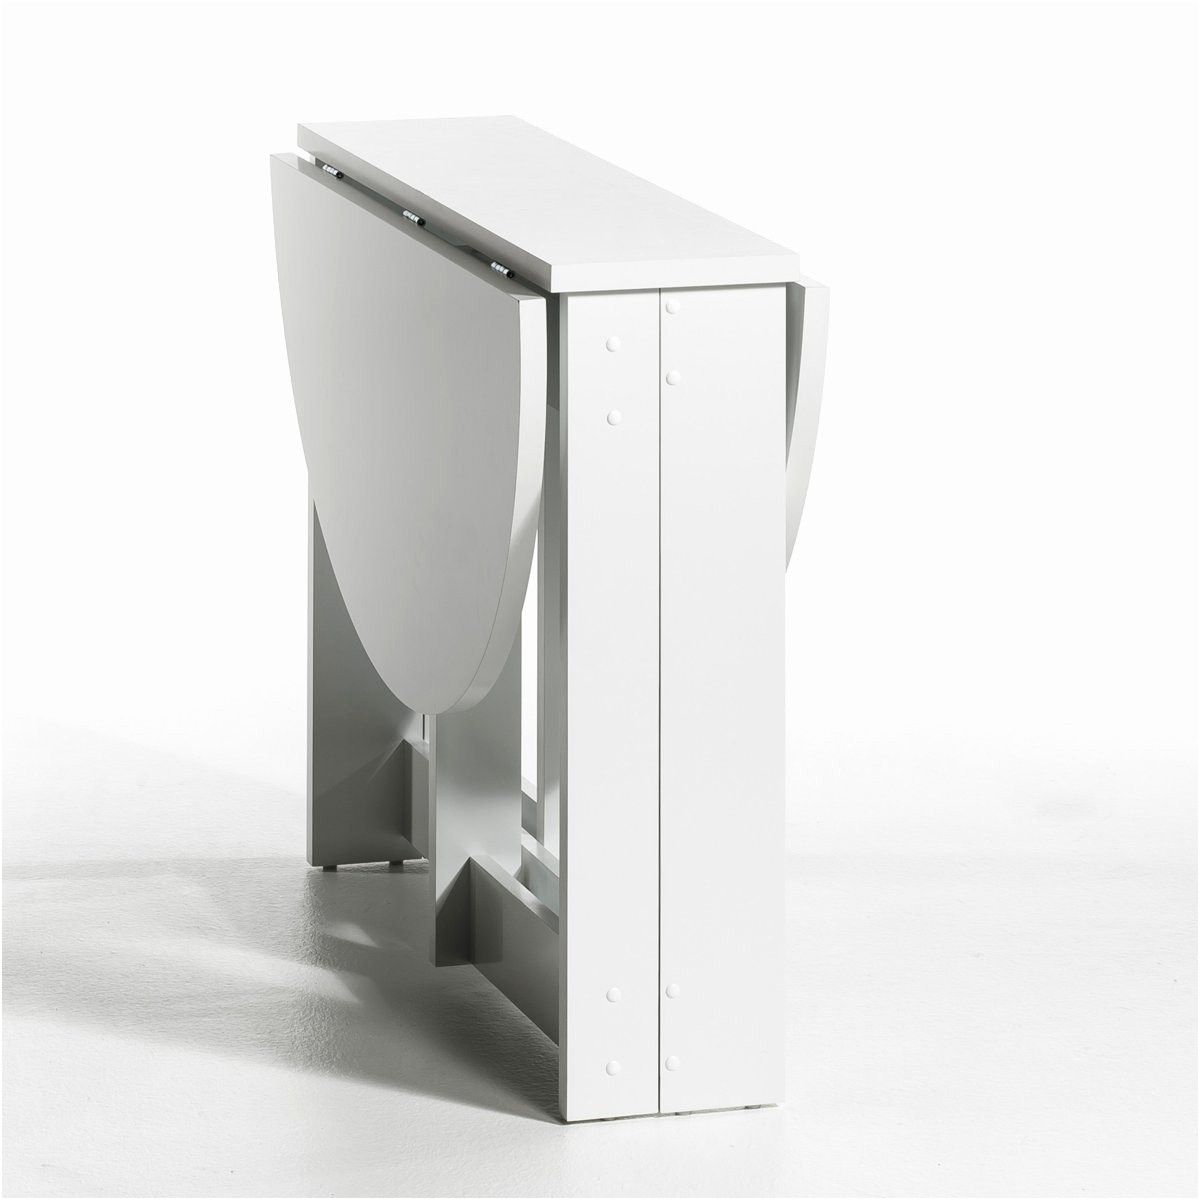 9 Amusant Table Pliante Ikea Photograph   Minimalis pour Ikea Table Pliante Jardin